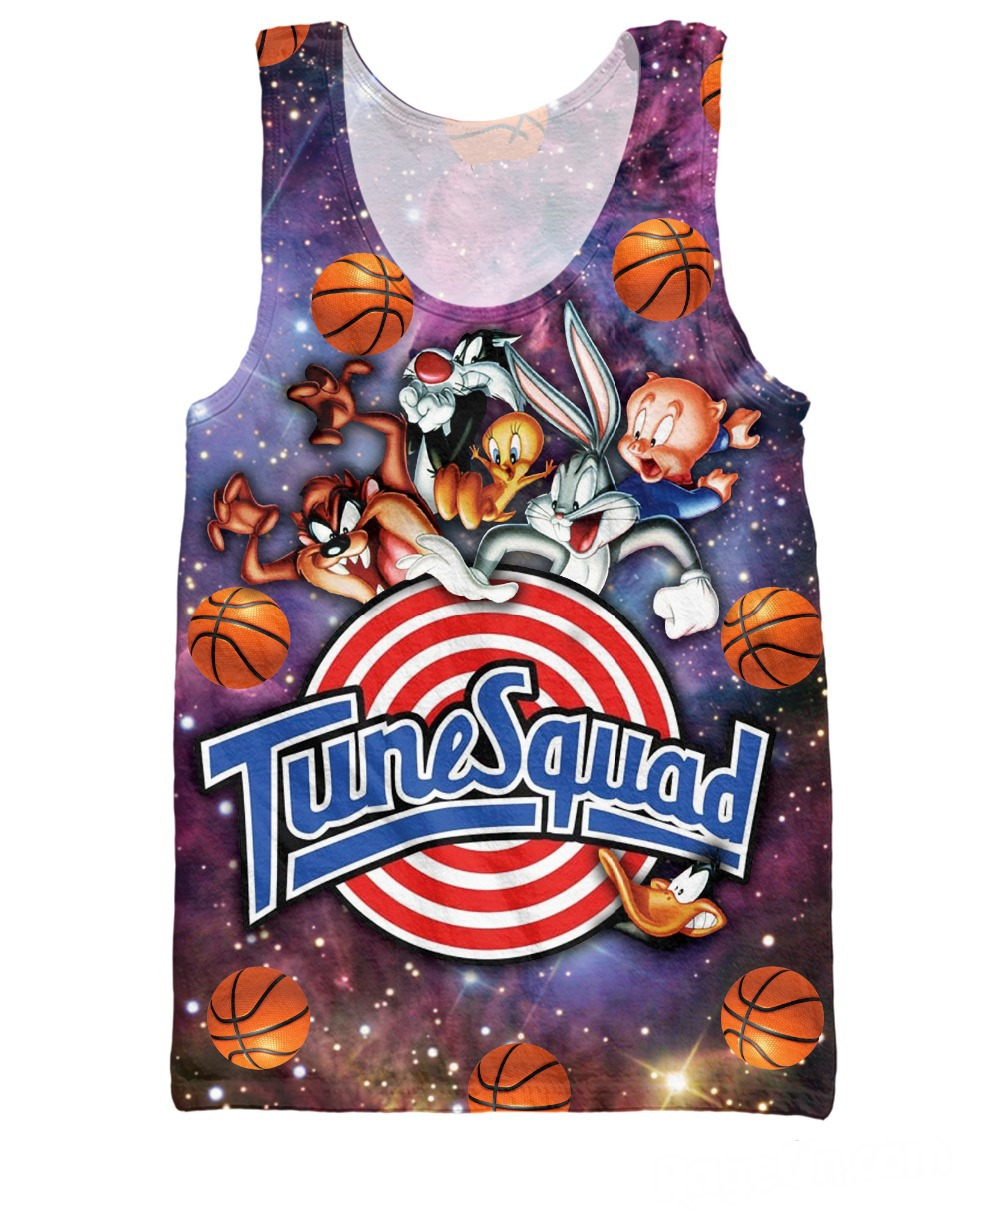 Tweety Bird Basketball